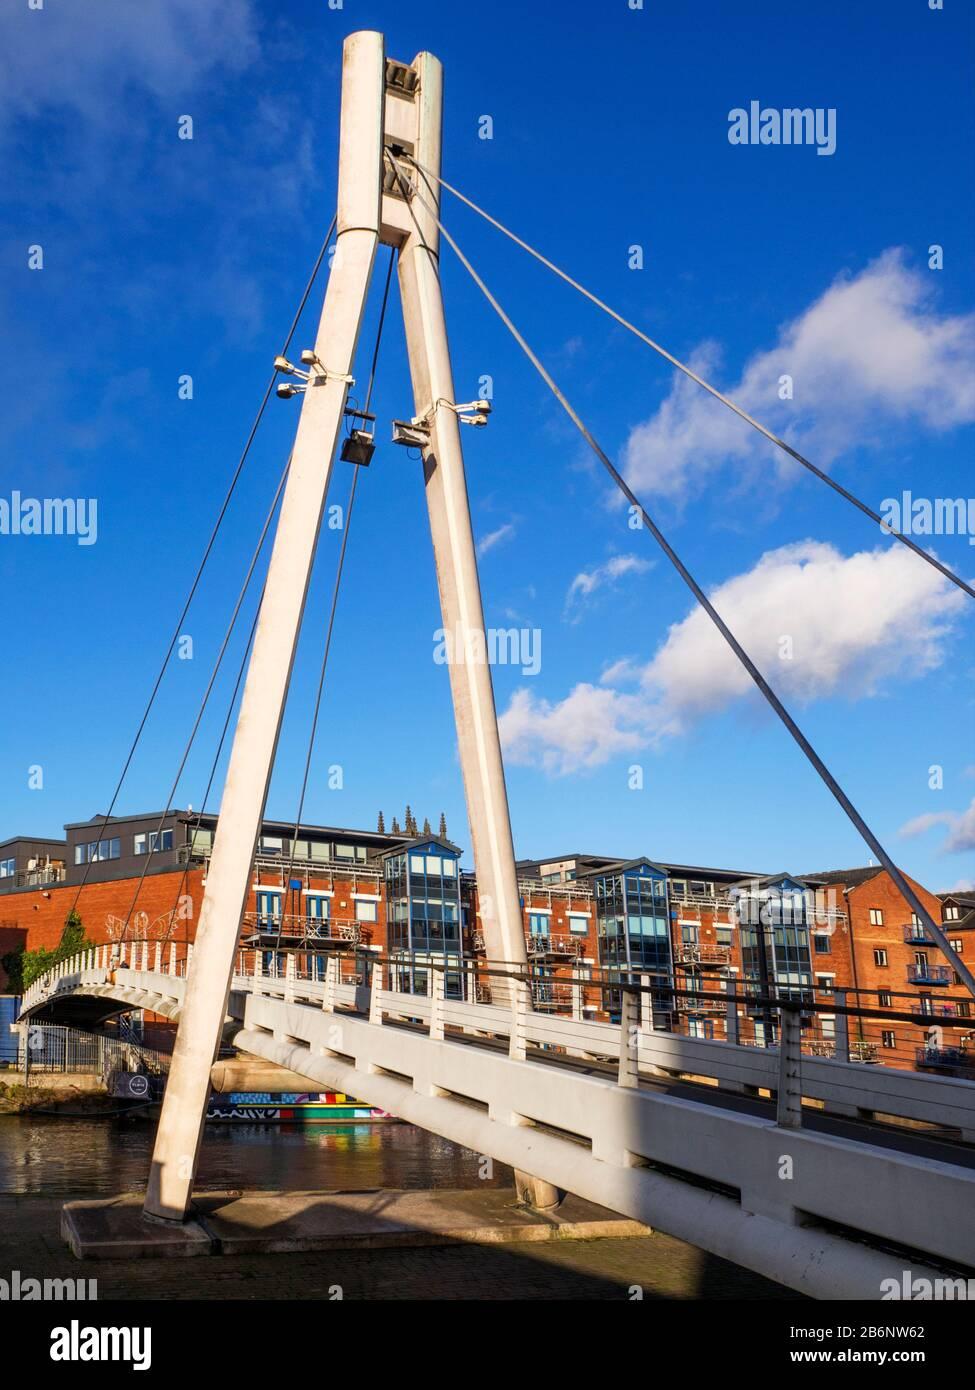 Centenery Bridge a modern pedestrian bridge over the River Aire in Leeds West Yorkshire England Stock Photo